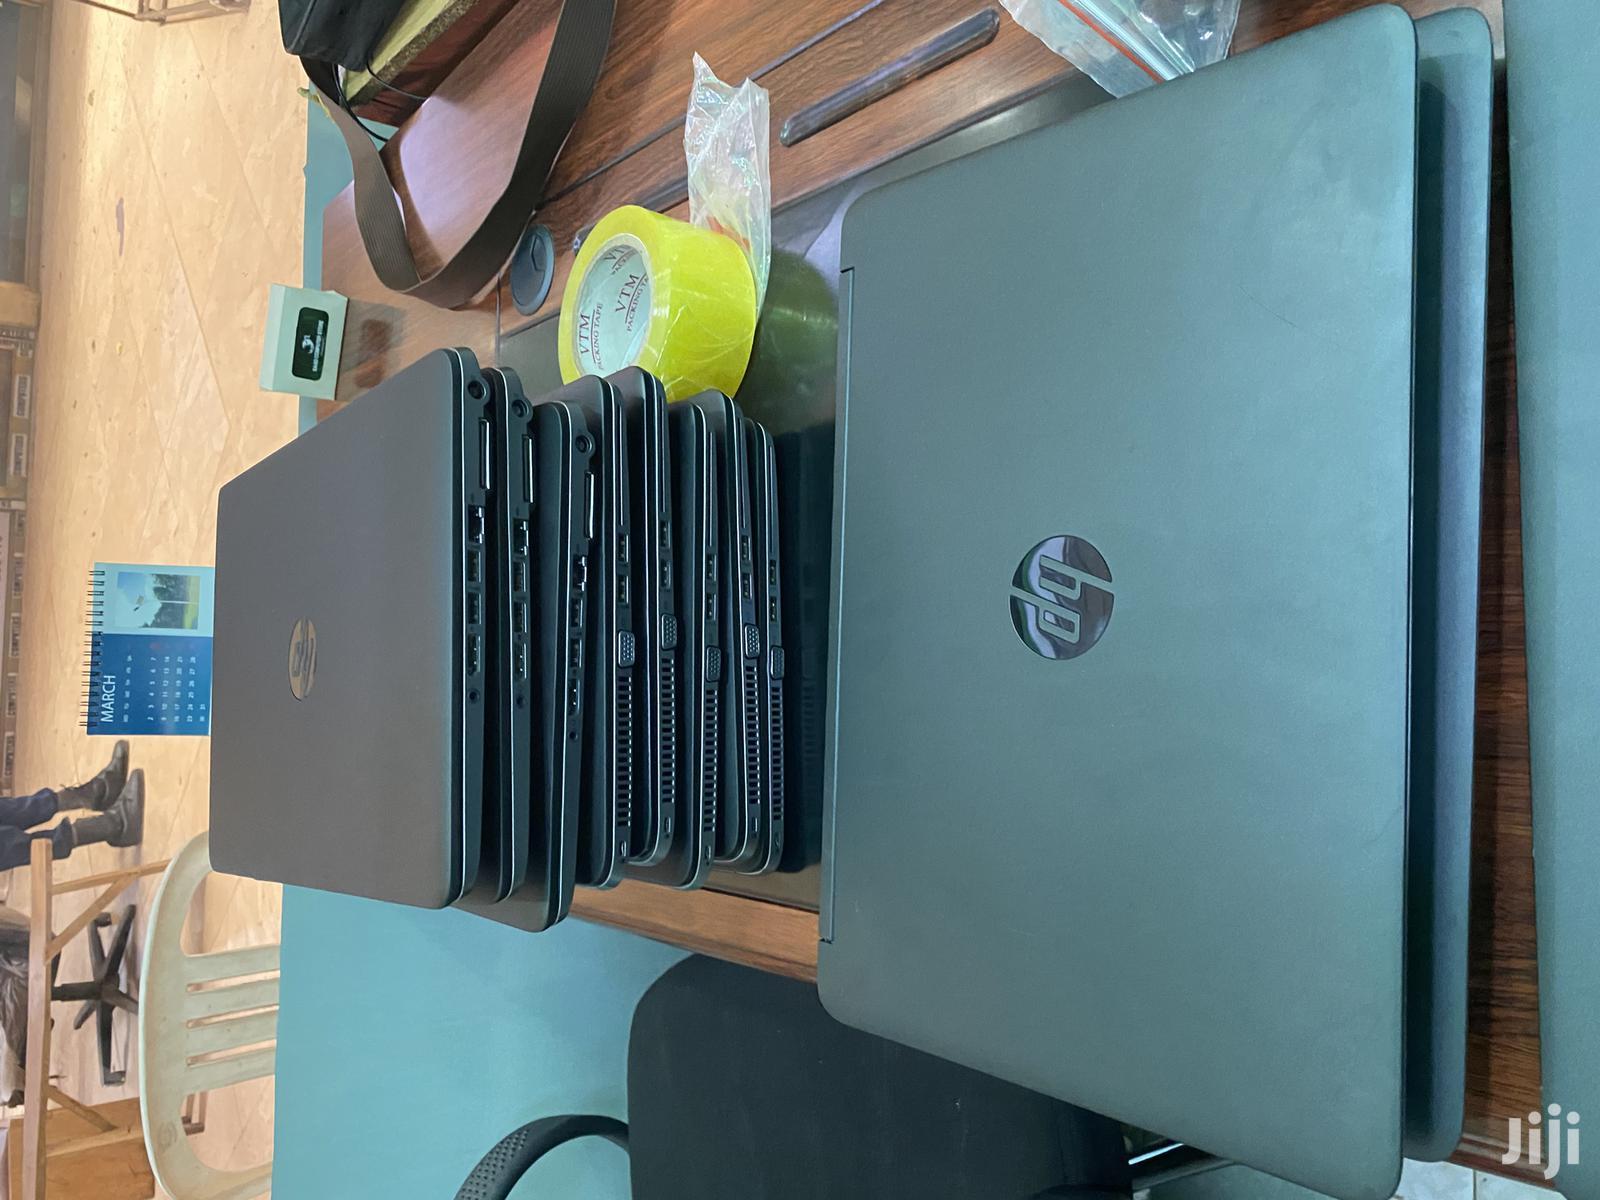 New Laptop HP EliteBook 840 G1 4GB Intel Core I5 HDD 500GB | Laptops & Computers for sale in Kampala, Central Region, Uganda